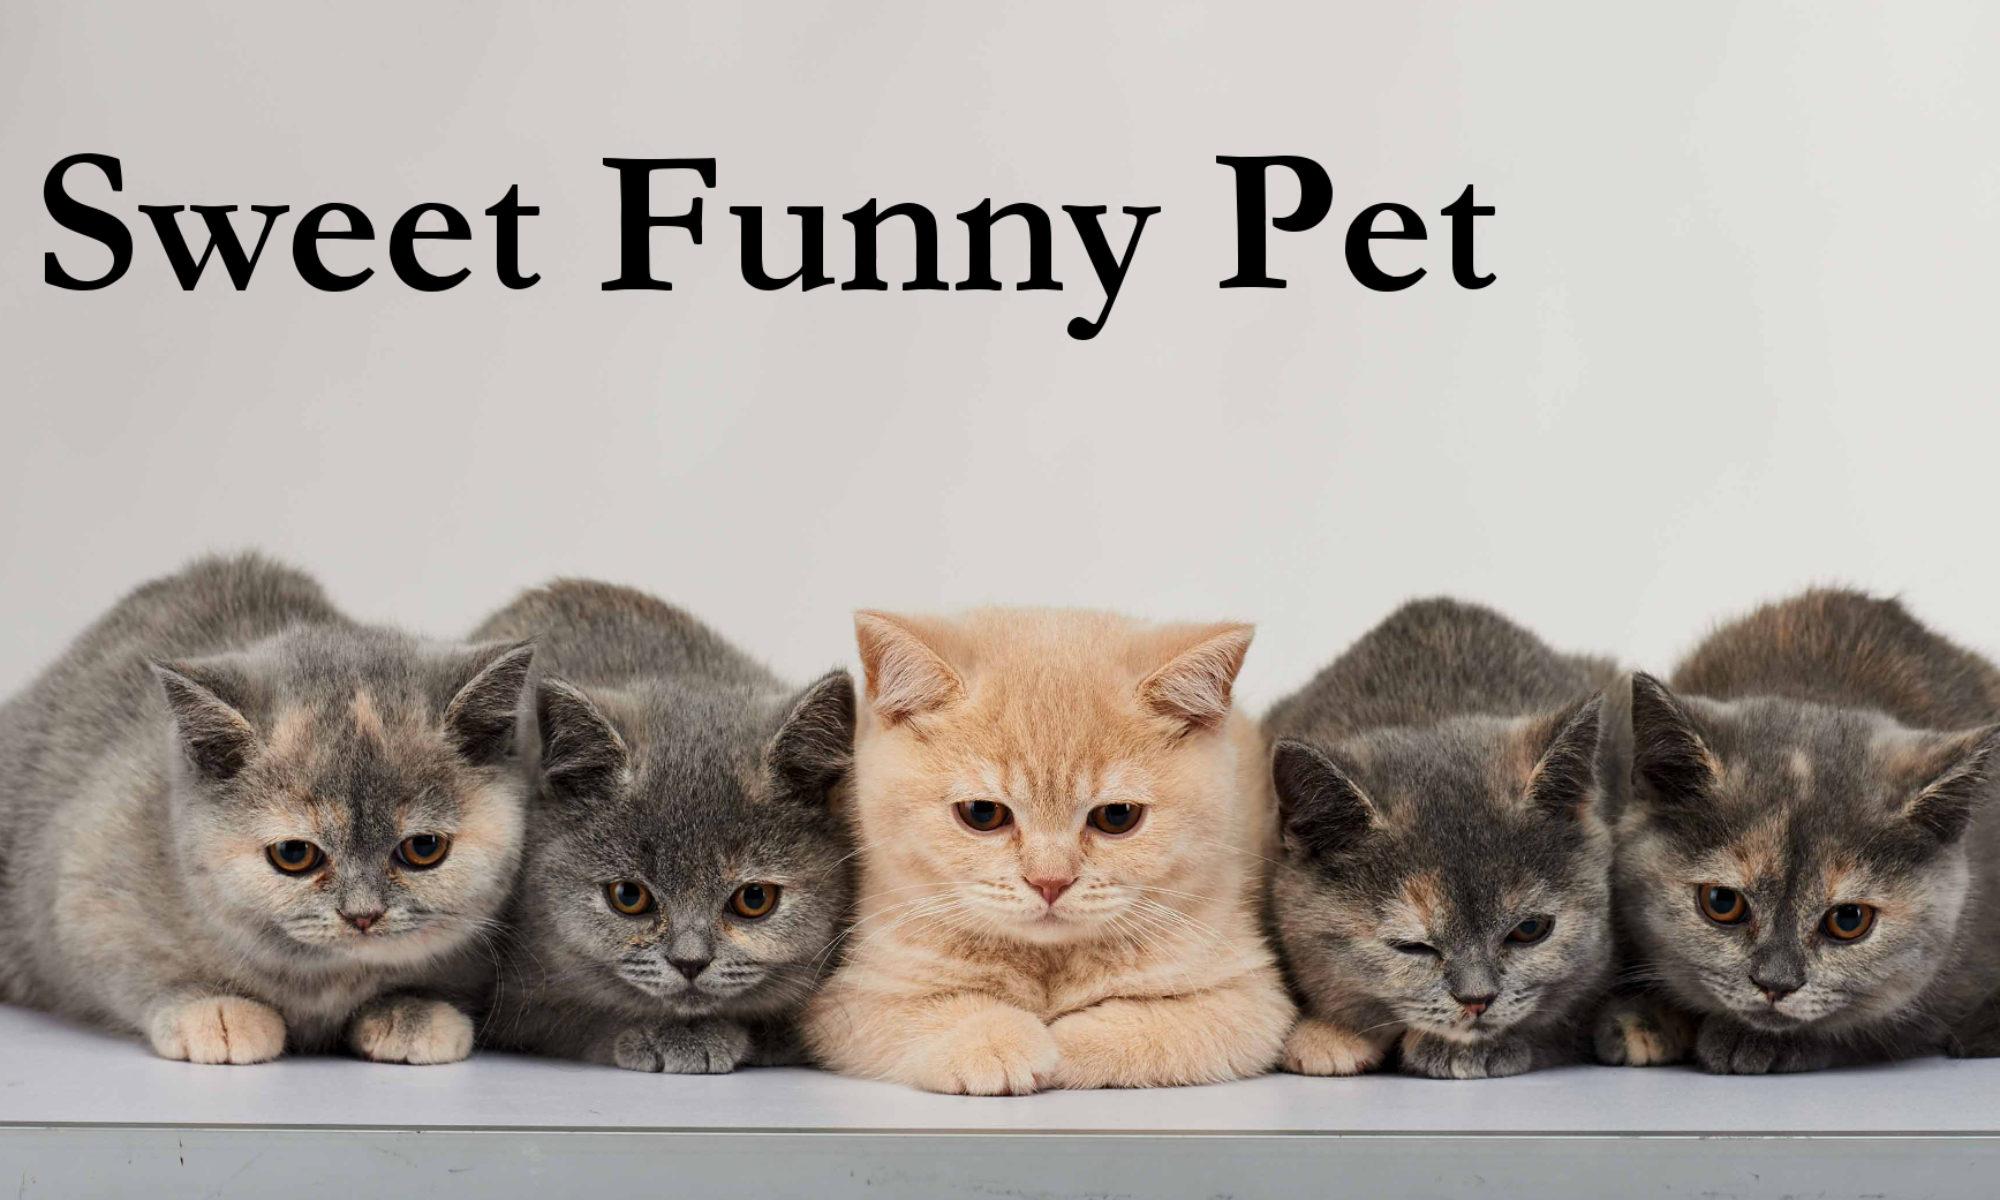 Sweet Funny Pet